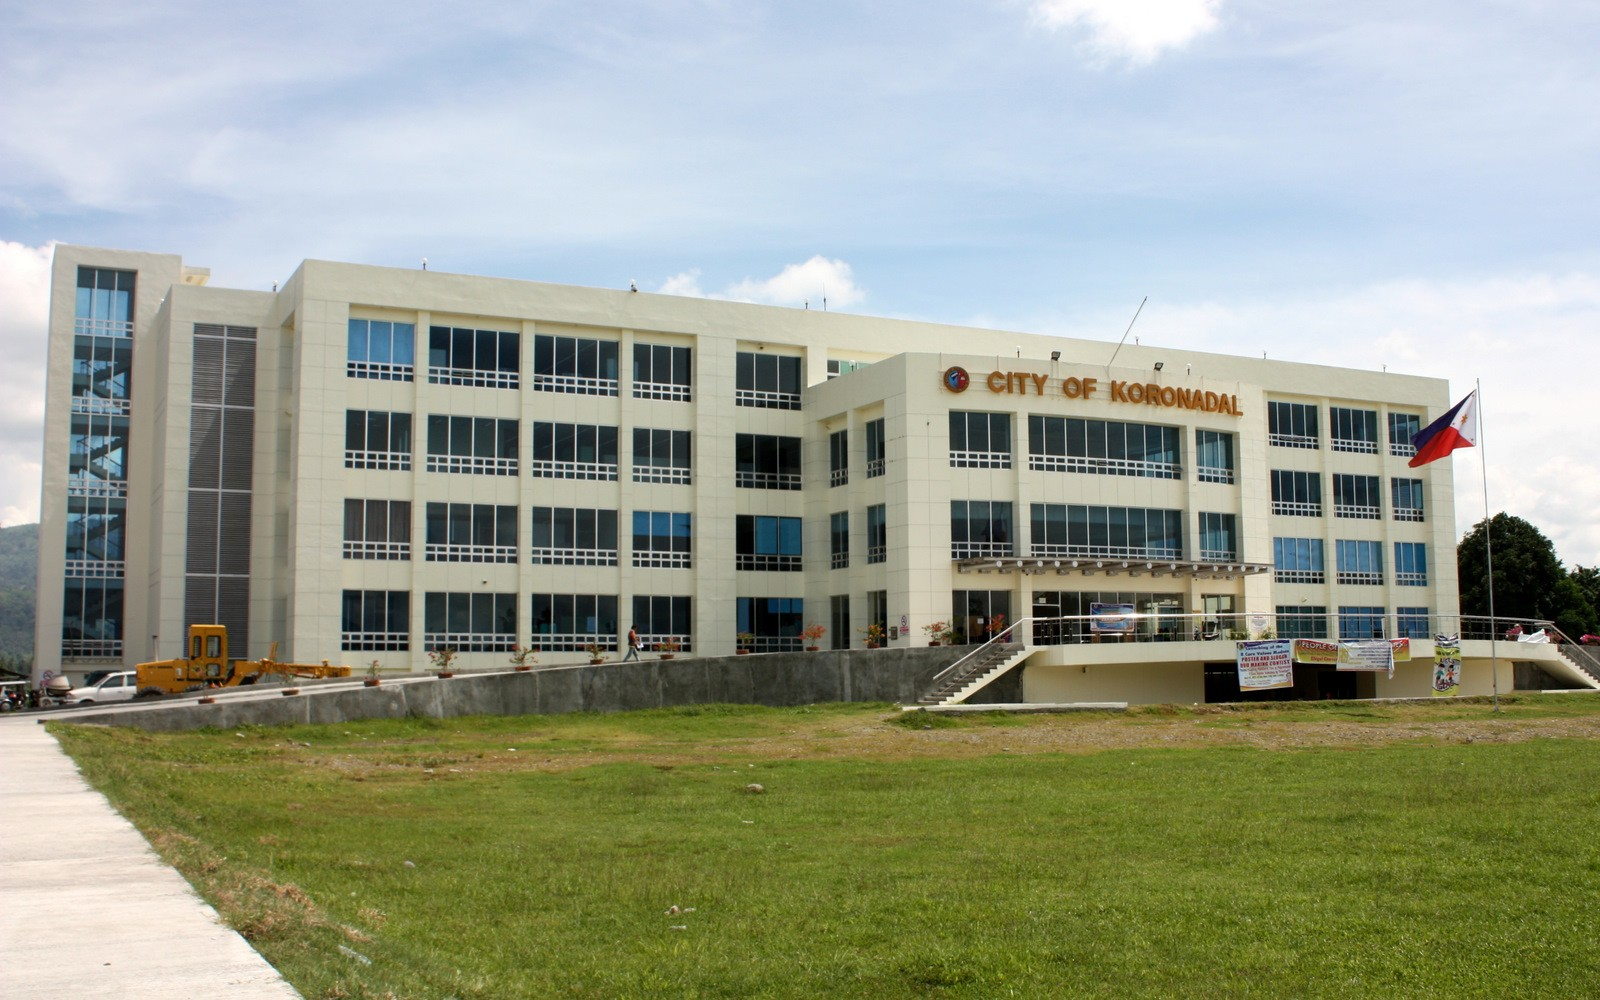 Coty Hall of Koronadal, South Cotabato. Photo by Ryan Jose Ruiz III / Wikipedia photo